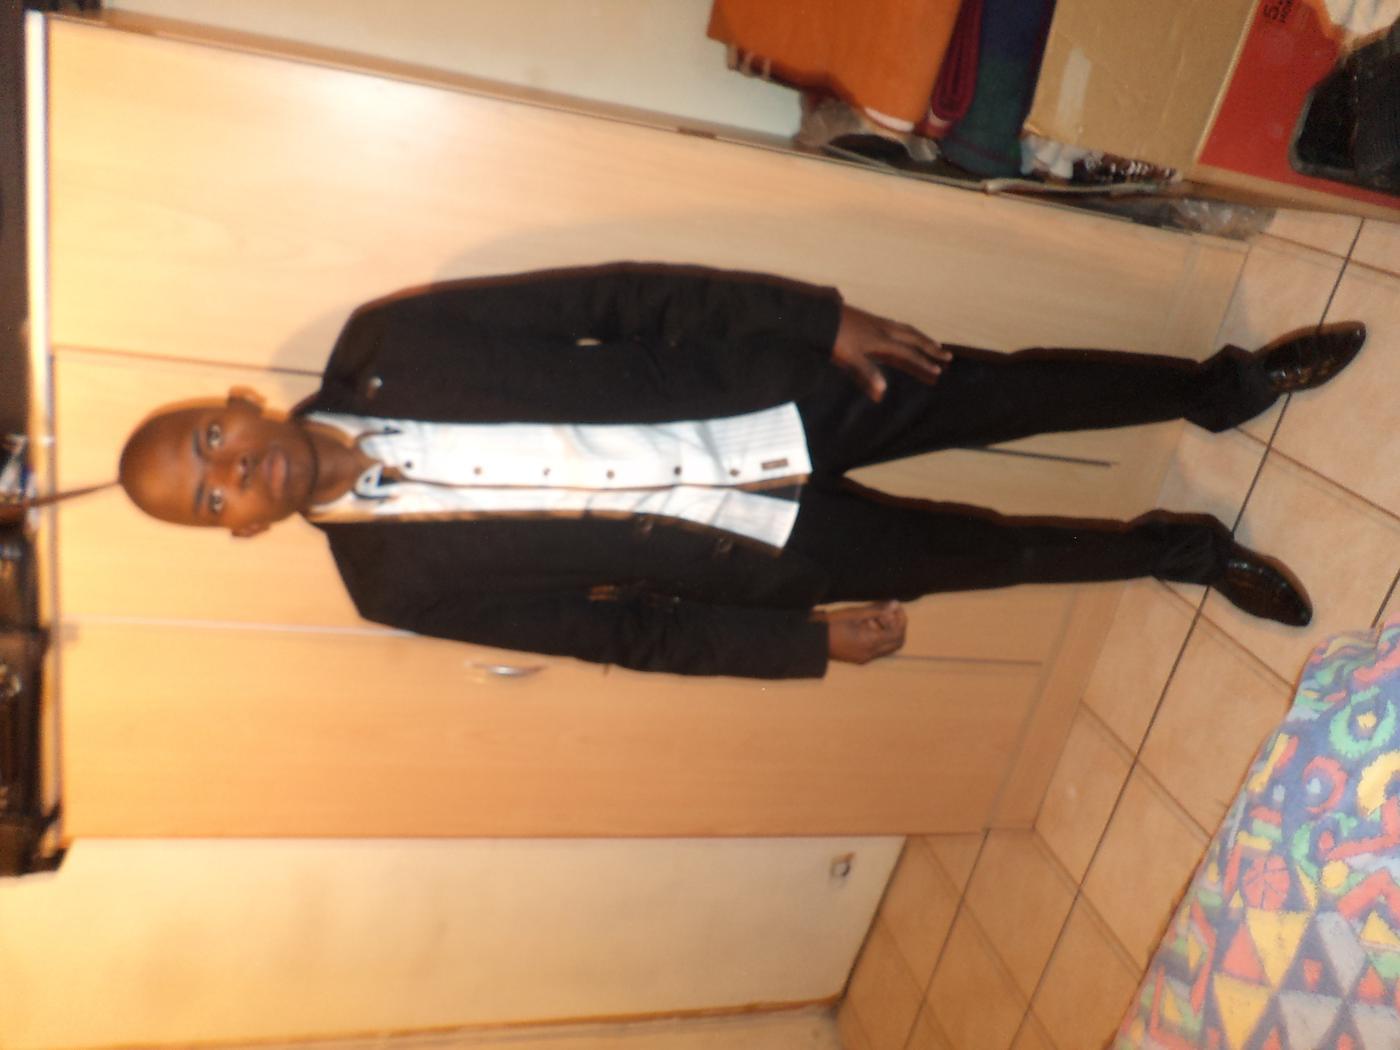 Tshepo Sechele